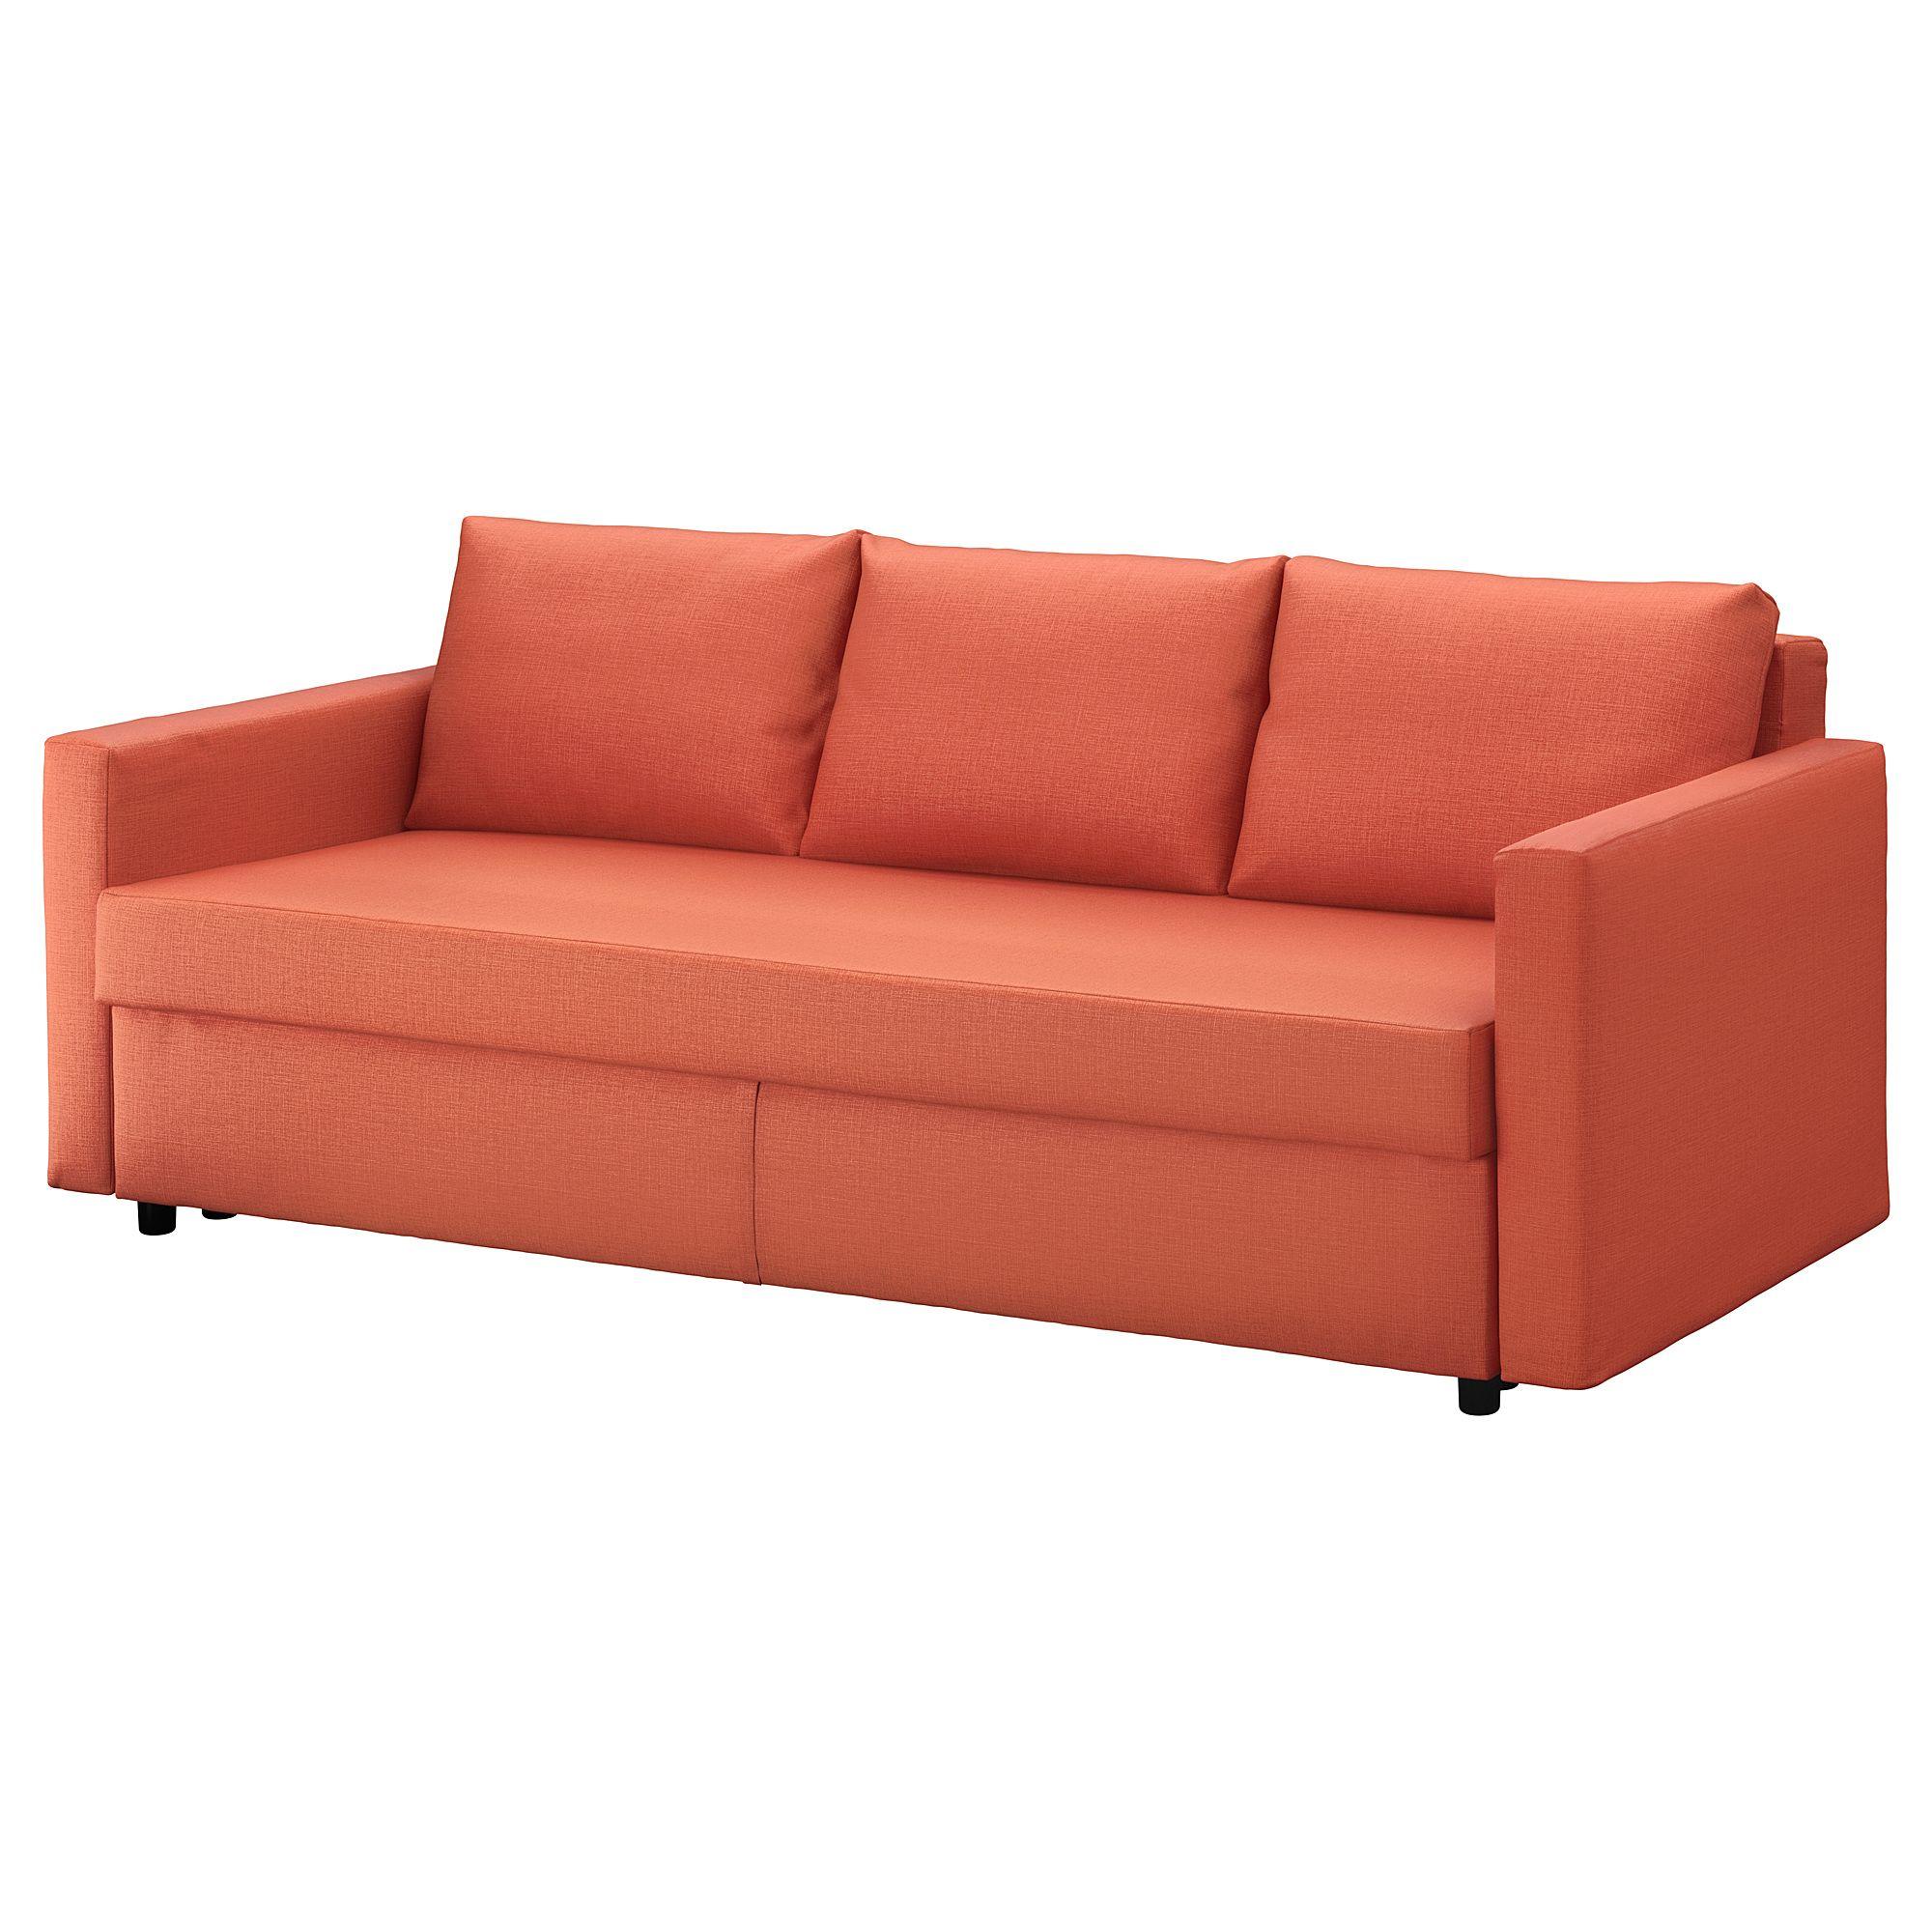 Furniture And Home Furnishings Ikea Sofa Orange Sofa Ikea Bed